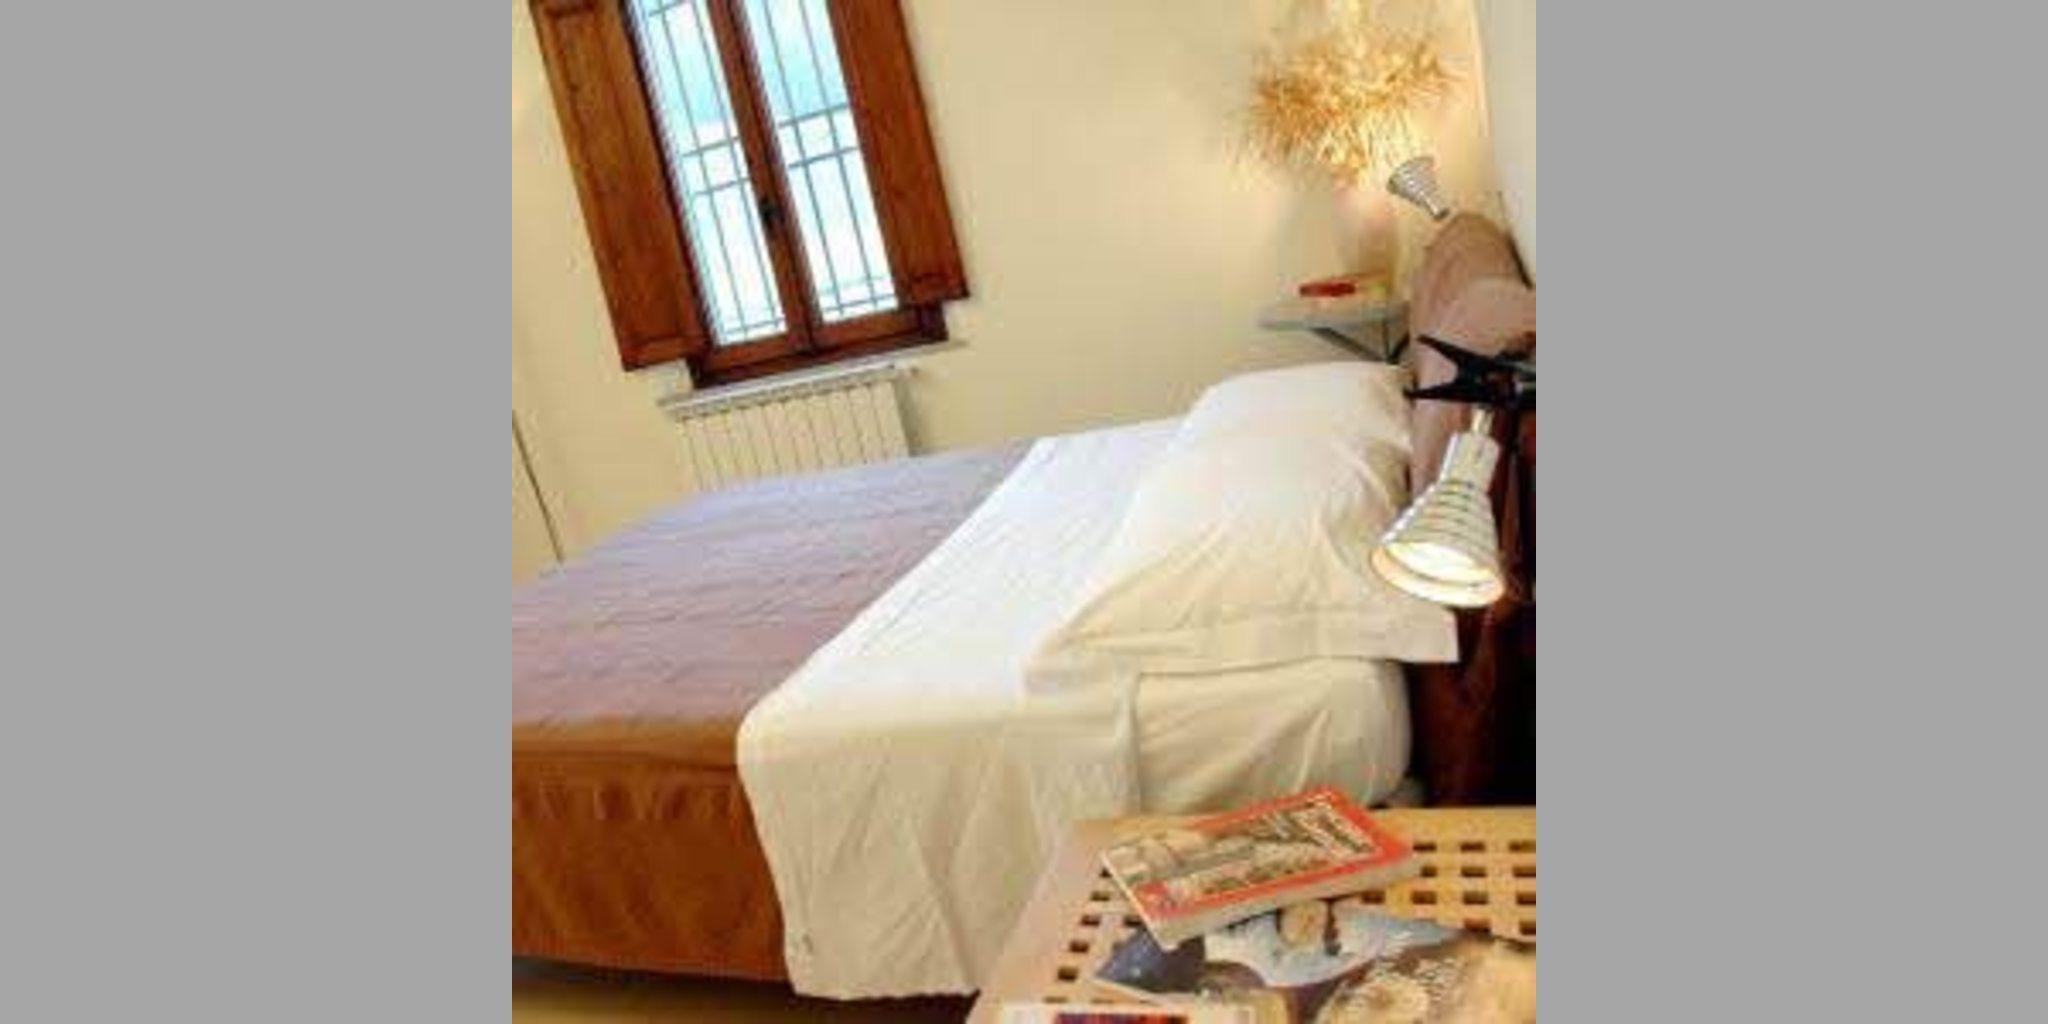 Bed & Breakfast San Miniato - Fornacino